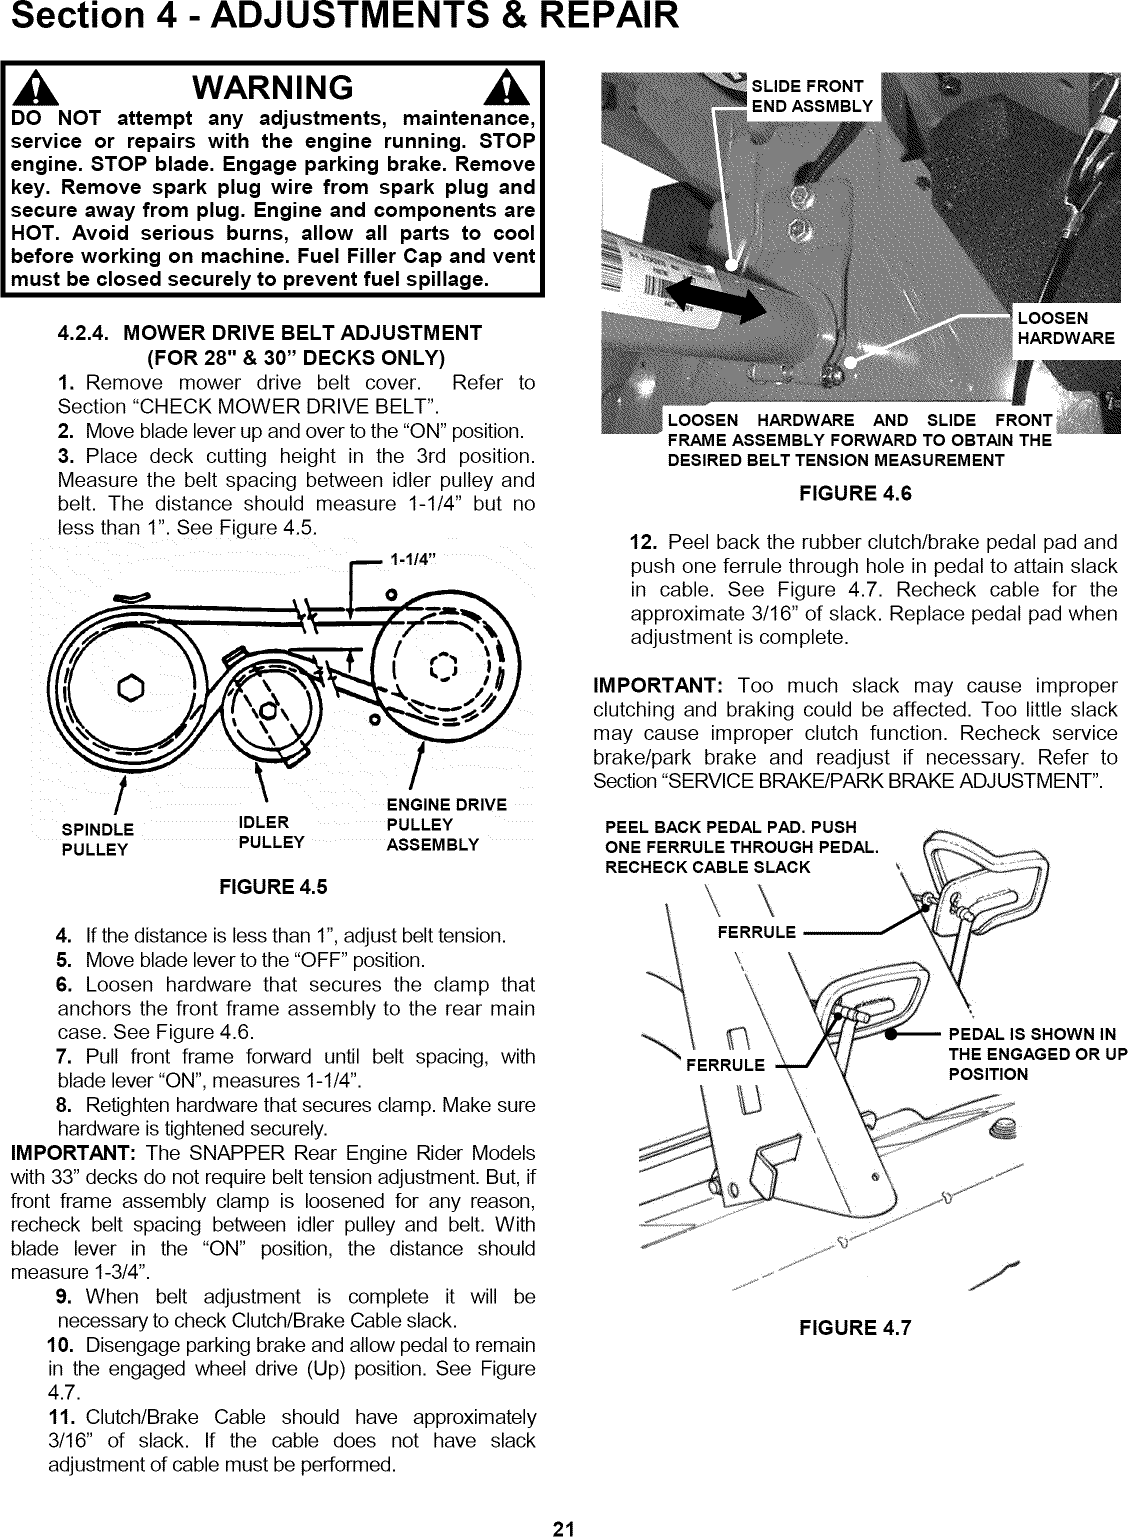 Patent Us20040096793 Manual Guide